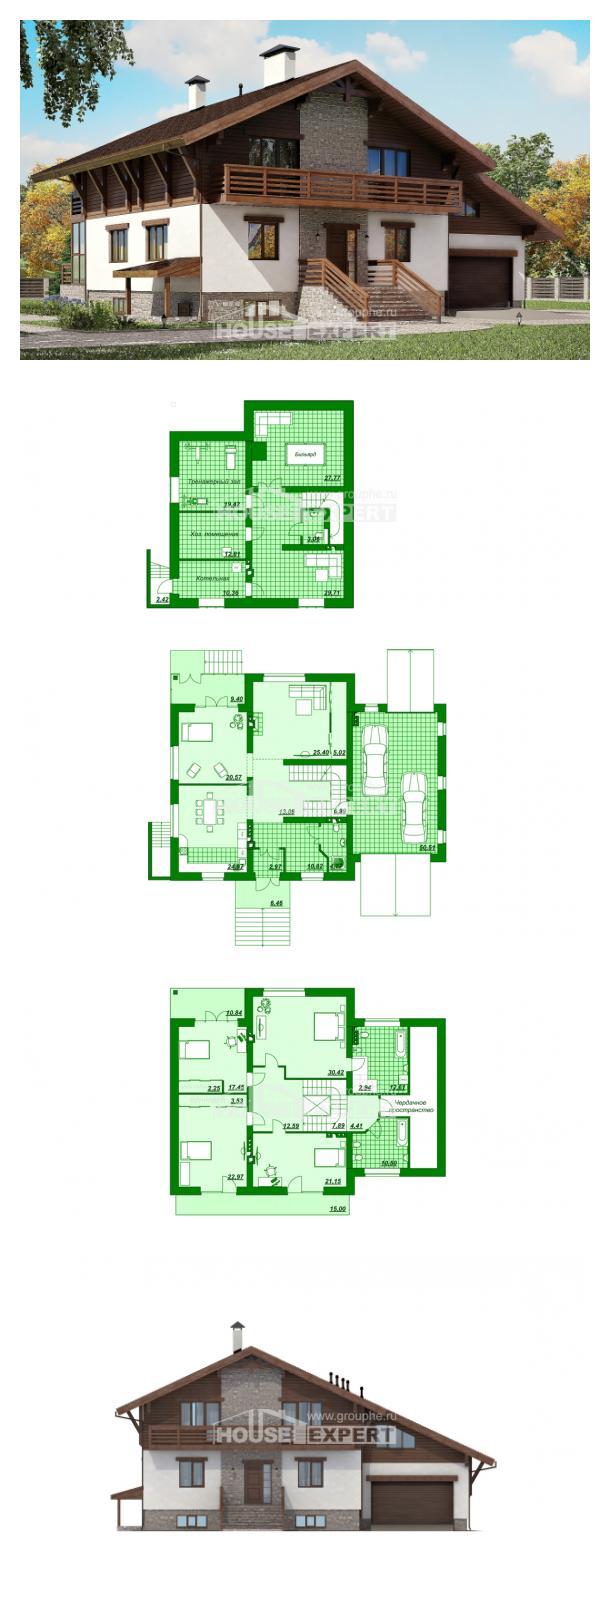 Projekt domu 420-001-R   House Expert